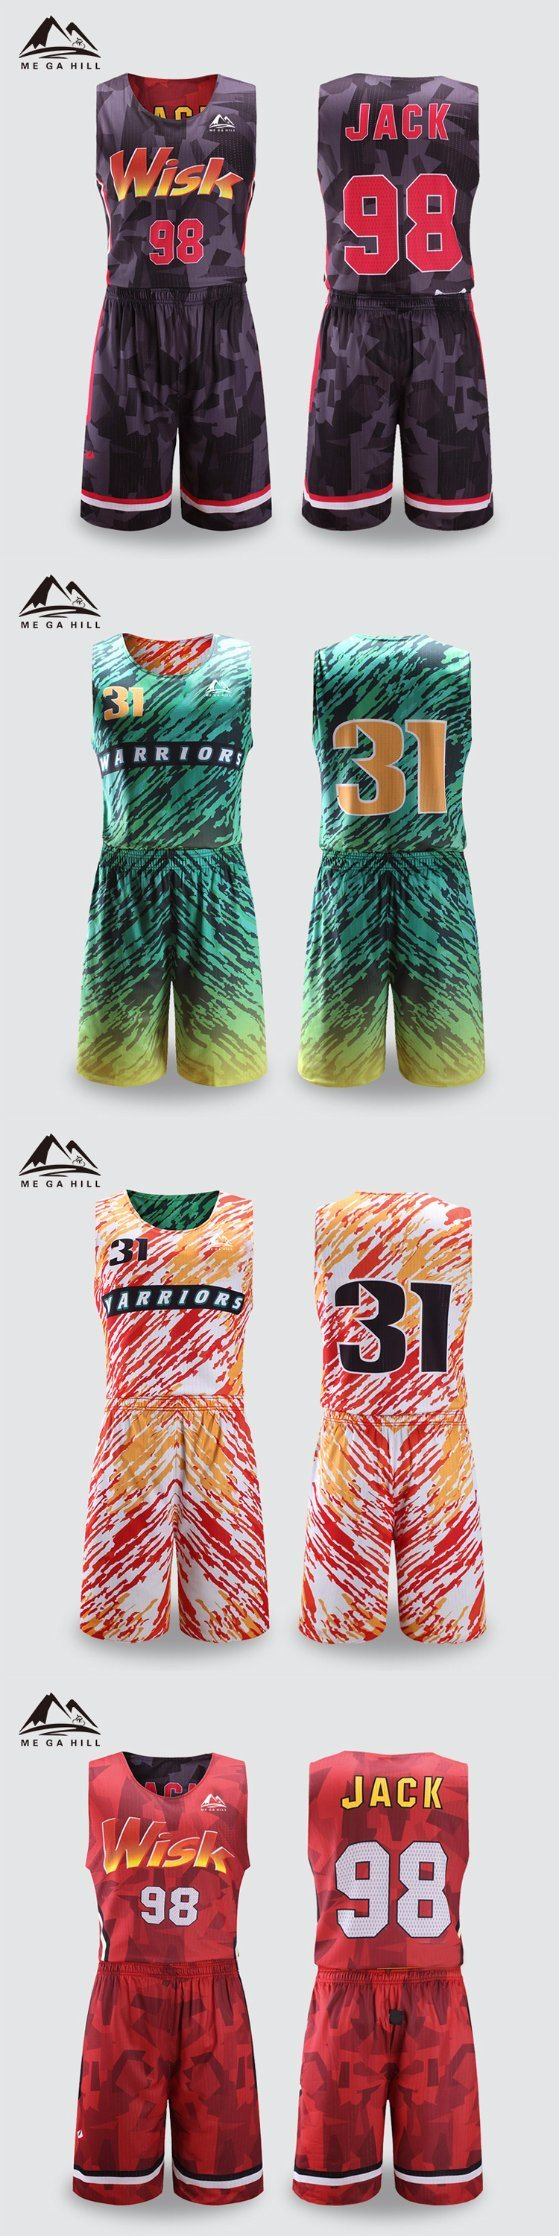 edd135cf66e Sublimation dri fit breathable basketball wear uniform tshirt clothes jersey